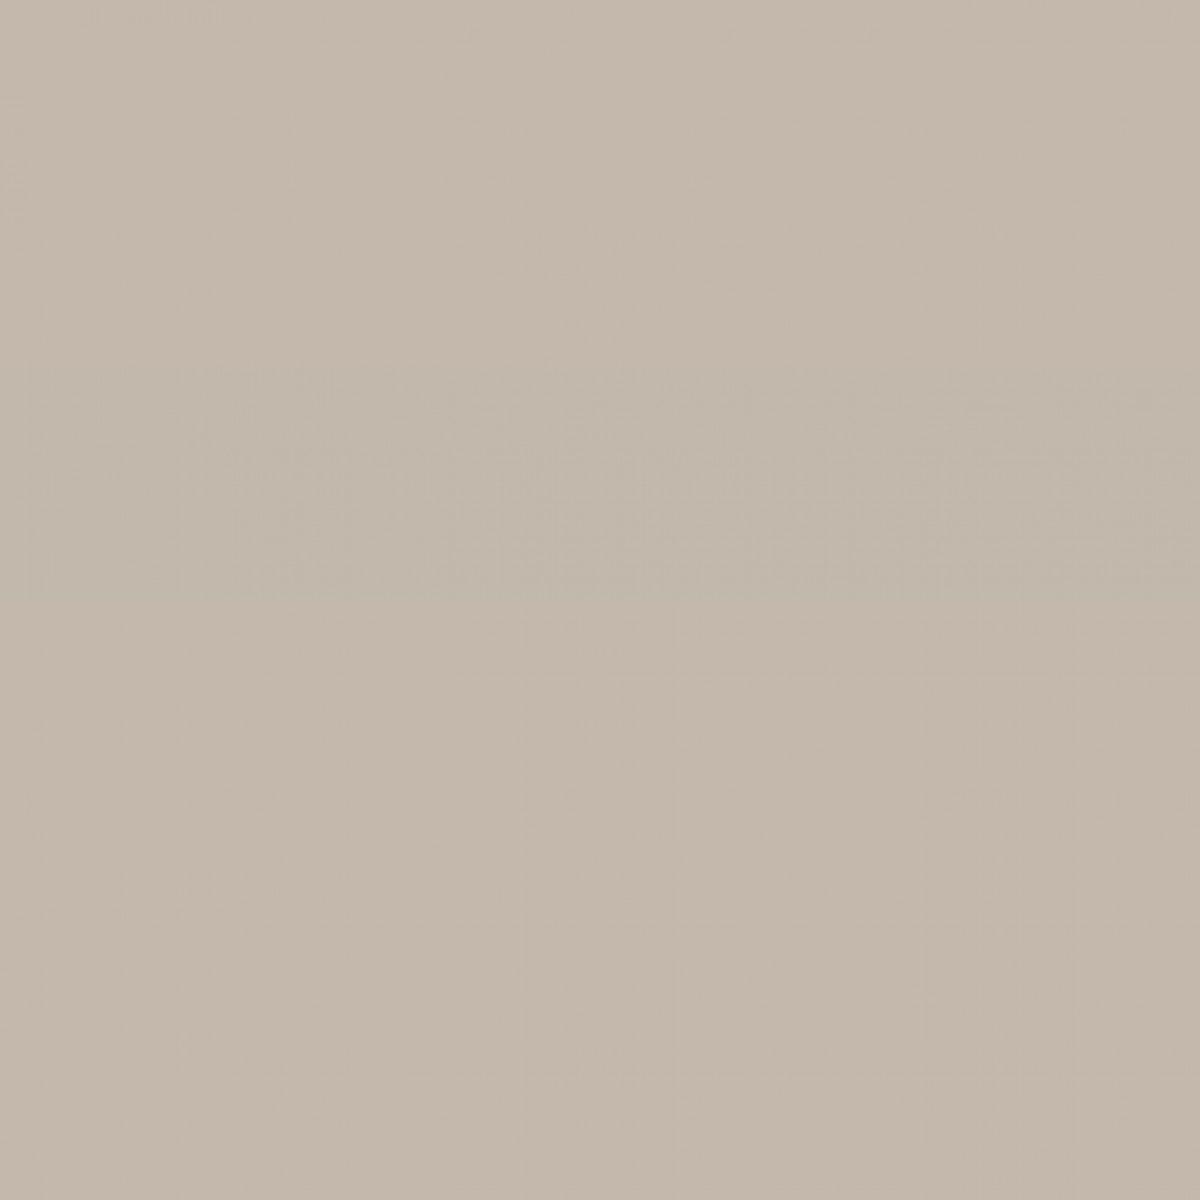 Caparol-3d-palazzo-85.jpg (1200×1200)